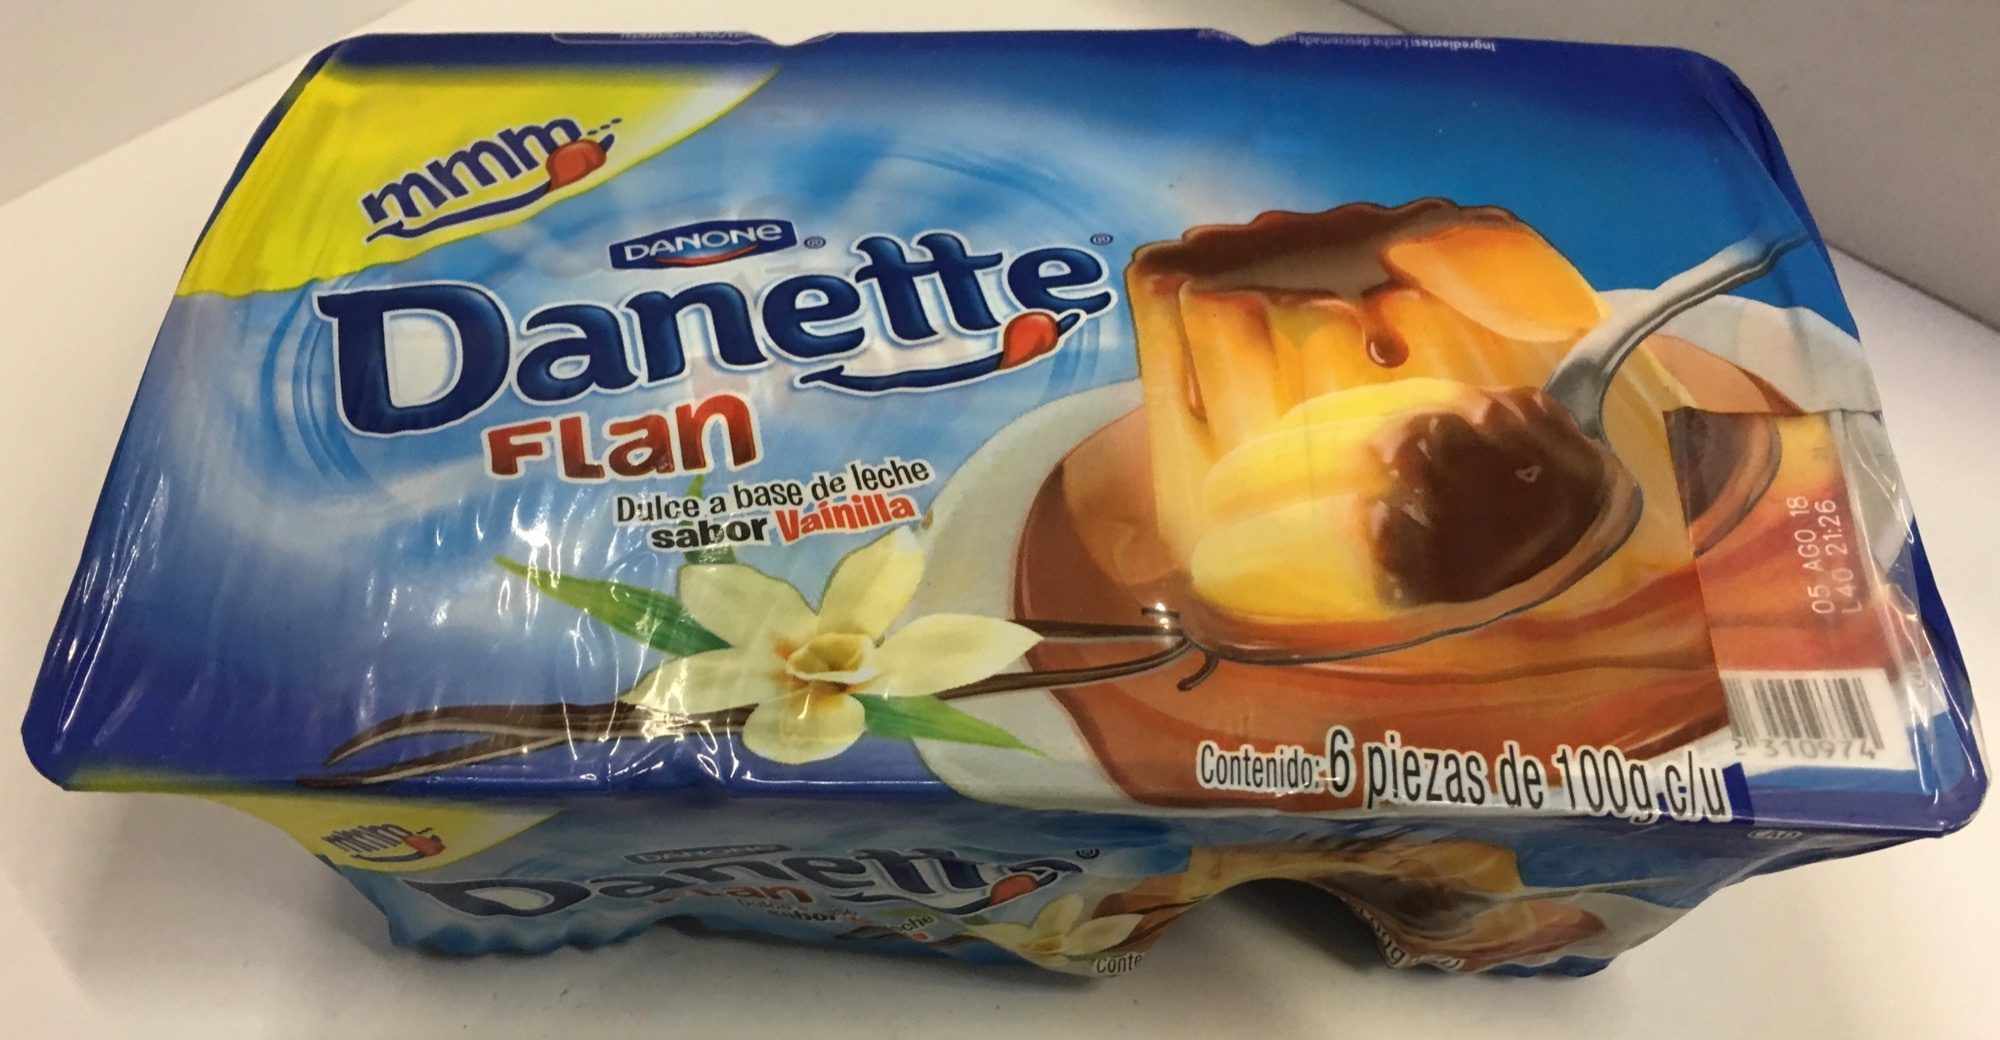 Flan Danette Danone - Product - es